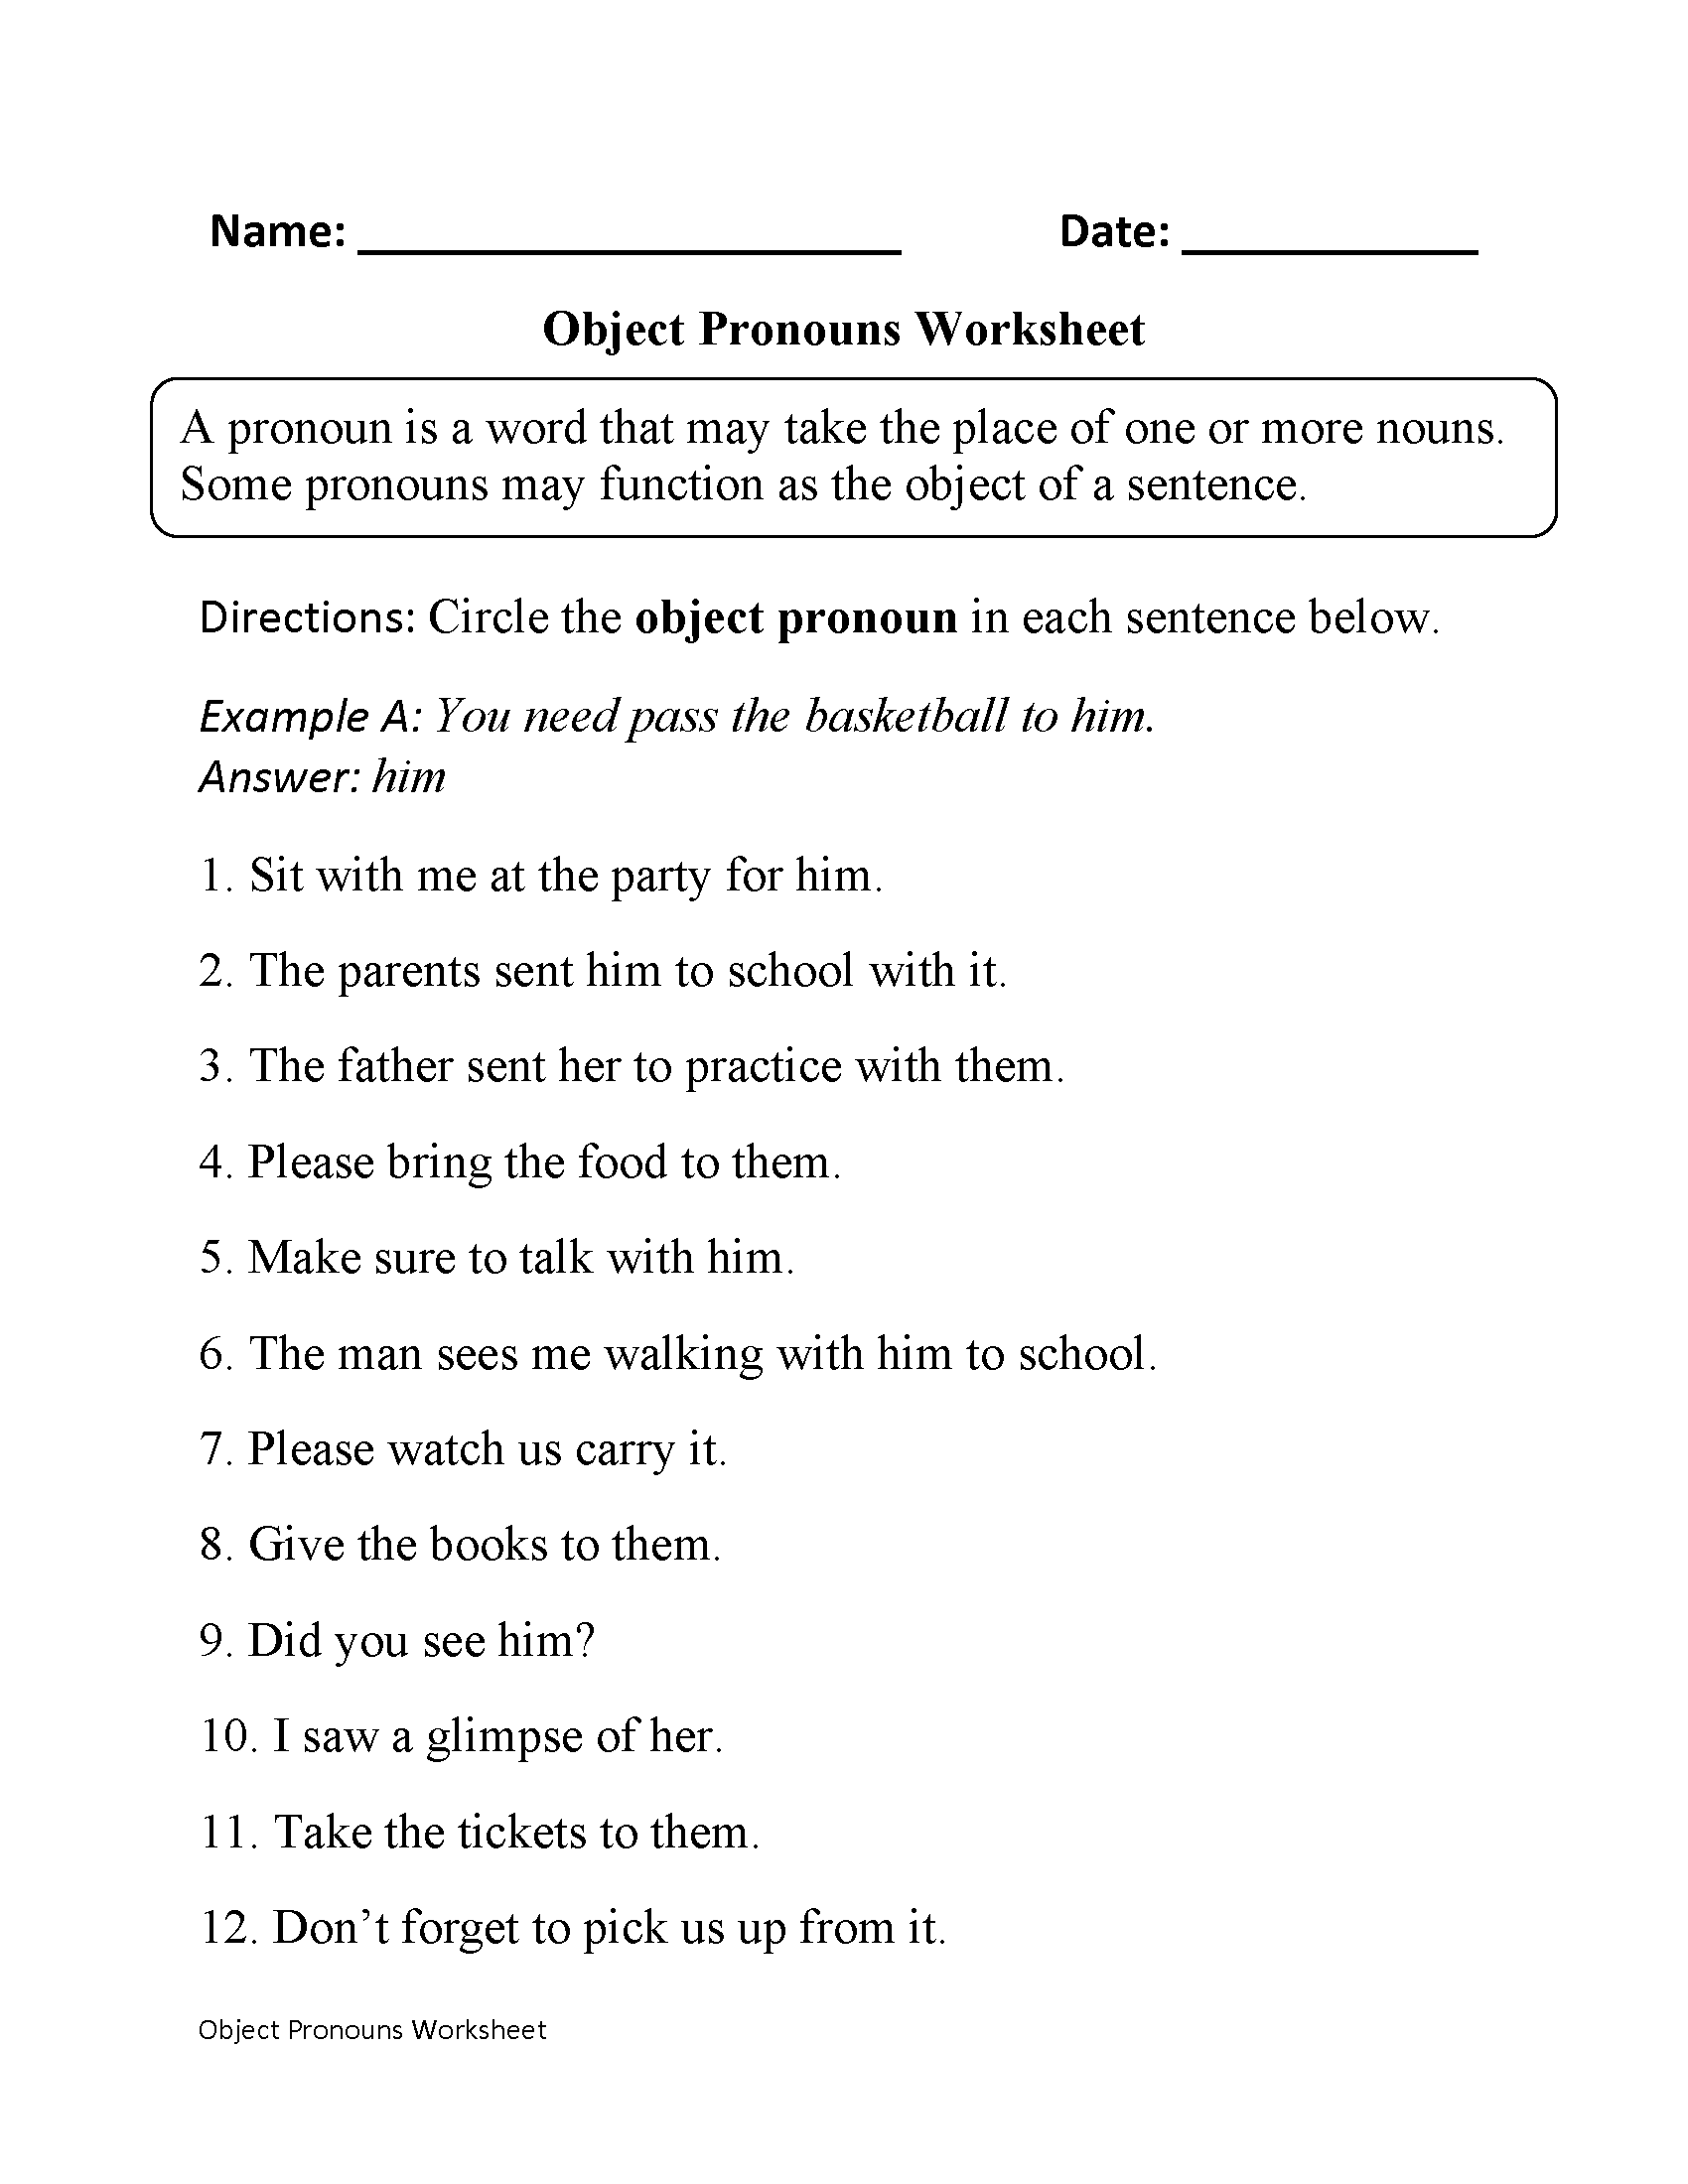 medium resolution of Pronouns Worksheets   Subject and Object Pronouns Worksheets   Pronoun  worksheets